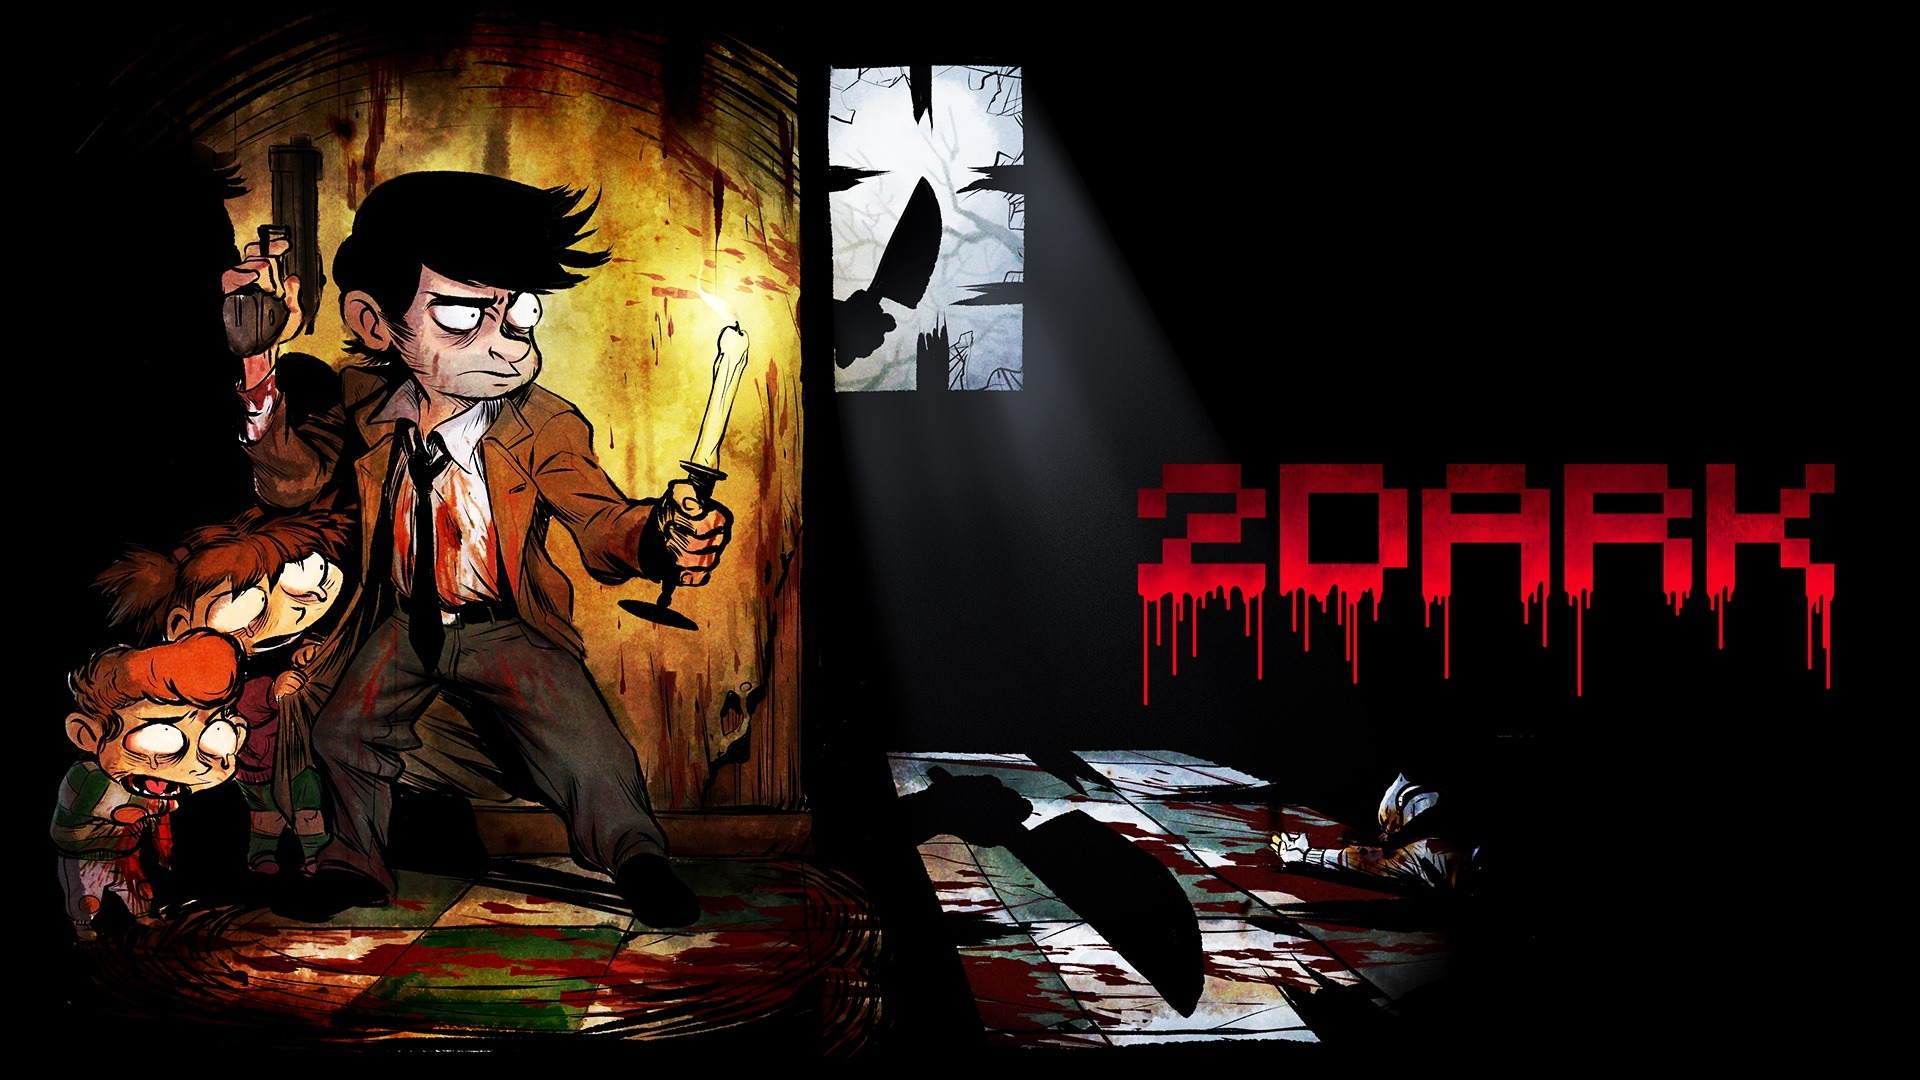 2Dark - Xbox One